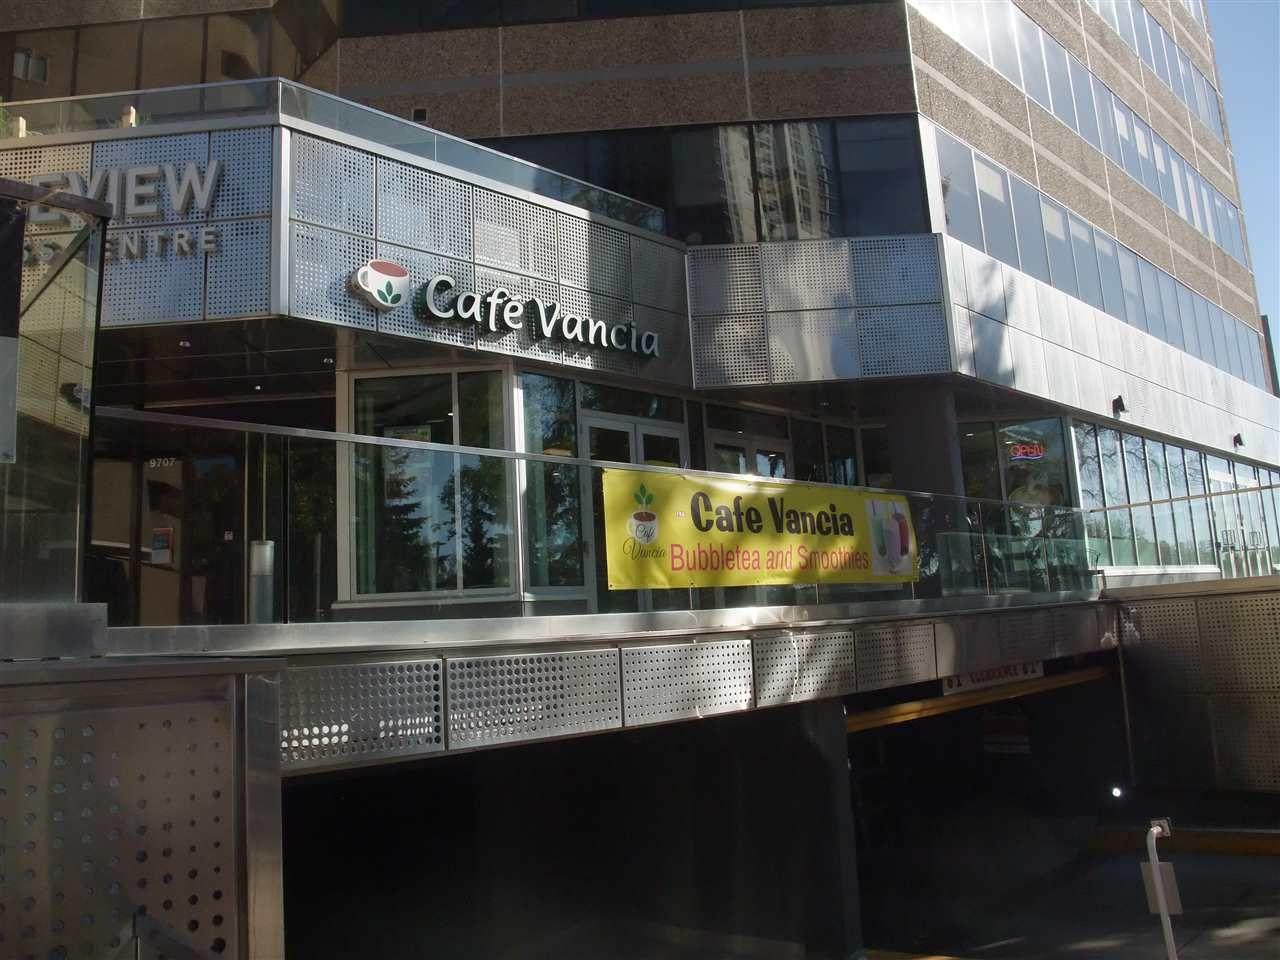 Main Photo: 9707 110 Street in Edmonton: Zone 12 Business for sale : MLS®# E4224506